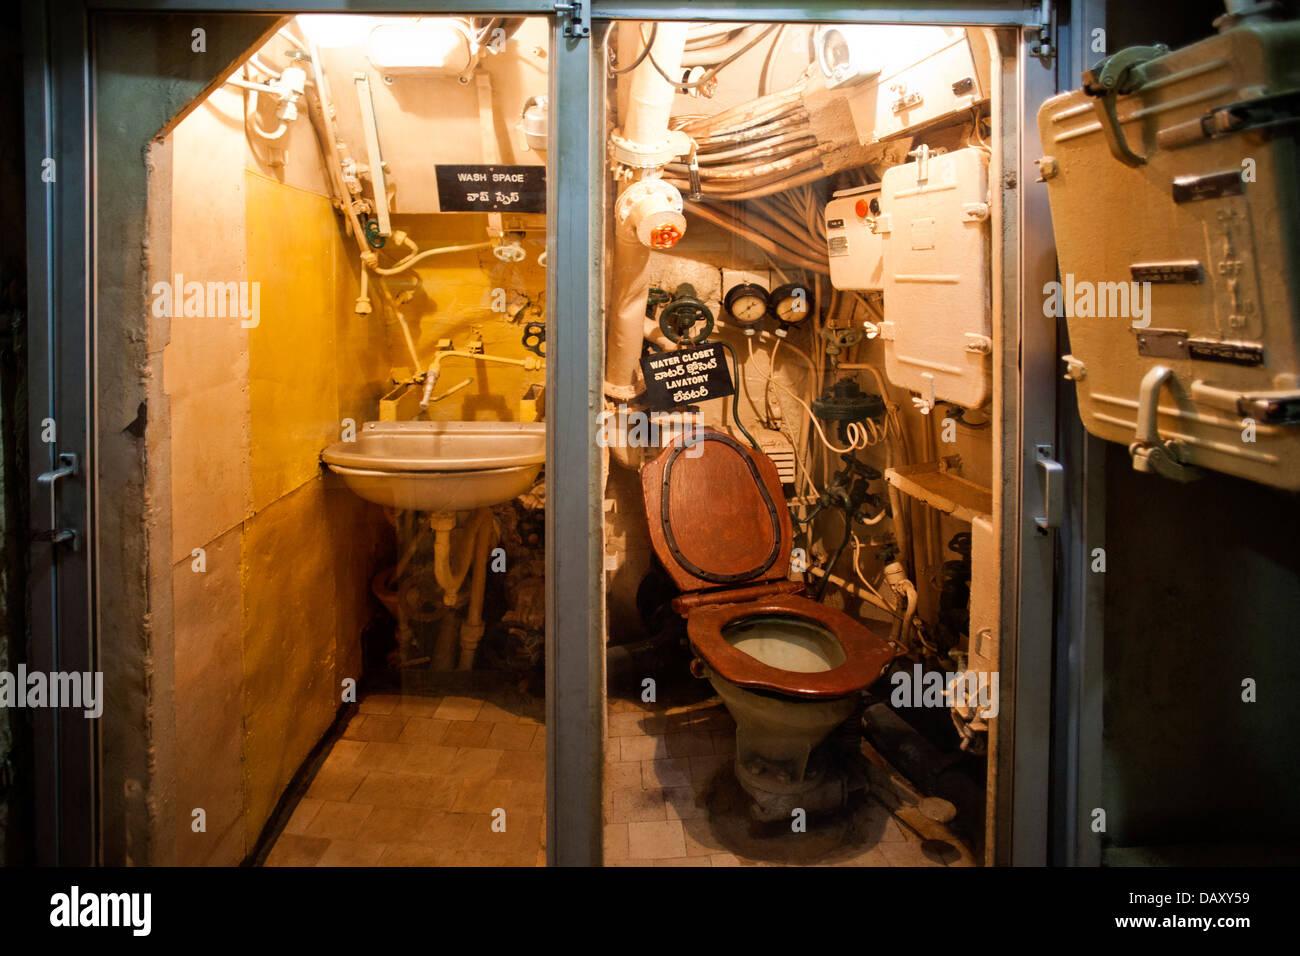 Bathroom of a Submarine, INS Kursura (S20), Ramakrishna Mission Beach, Visakhapatnam, Andhra Pradesh, India - Stock Image